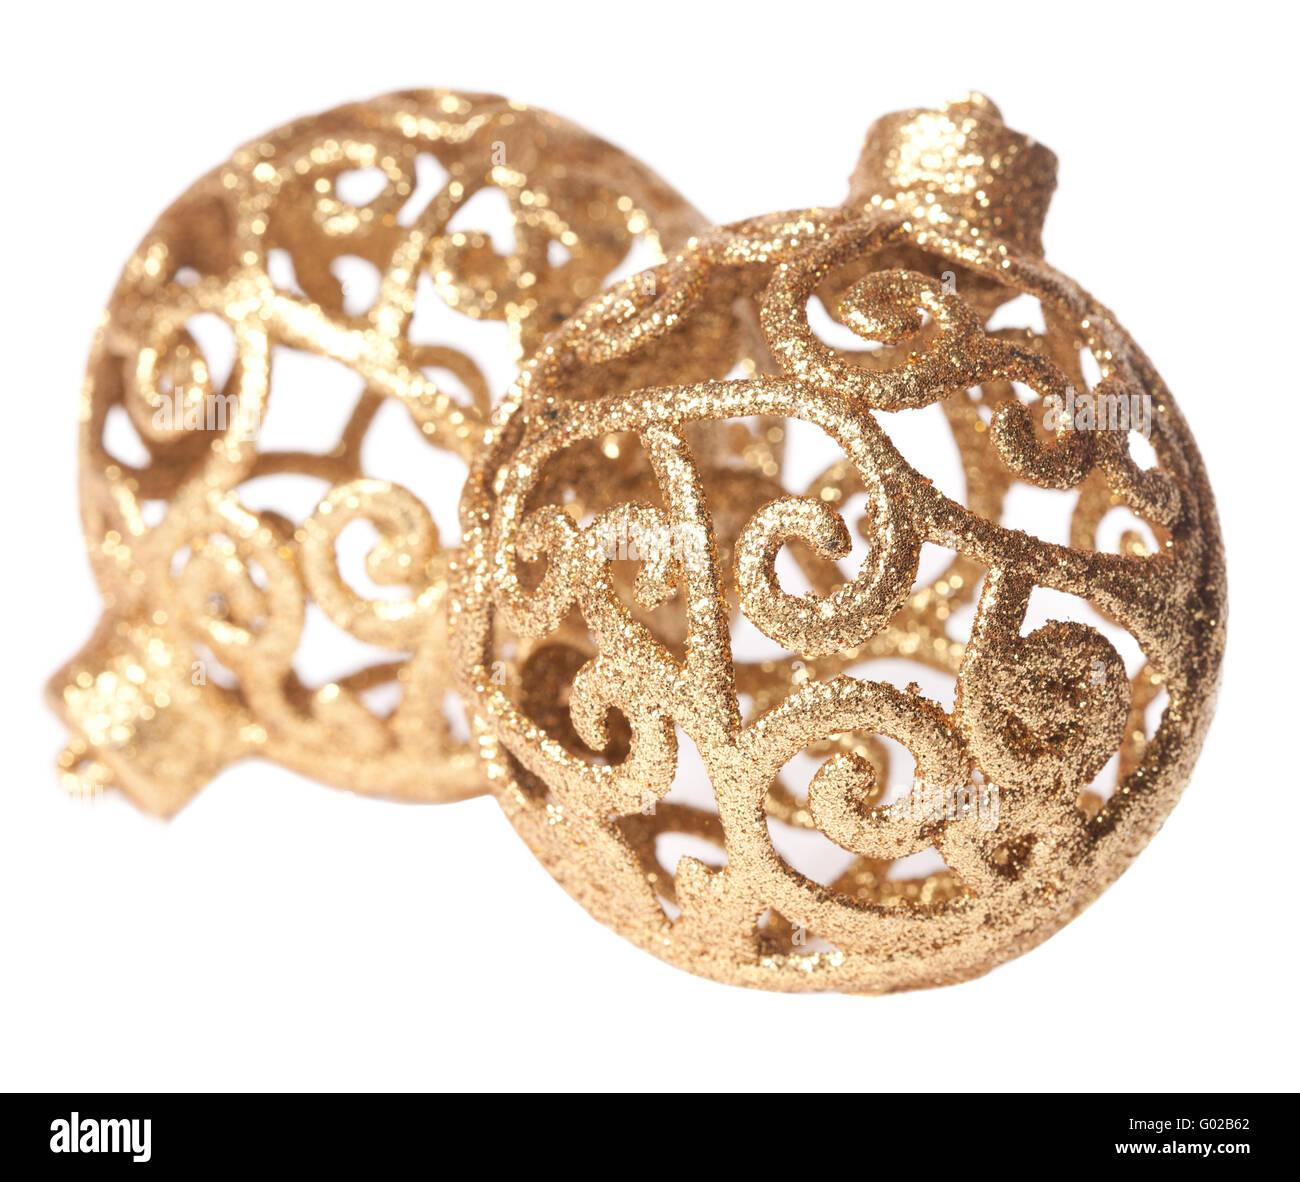 Golden Christmas balls lying on a white background - Stock Image